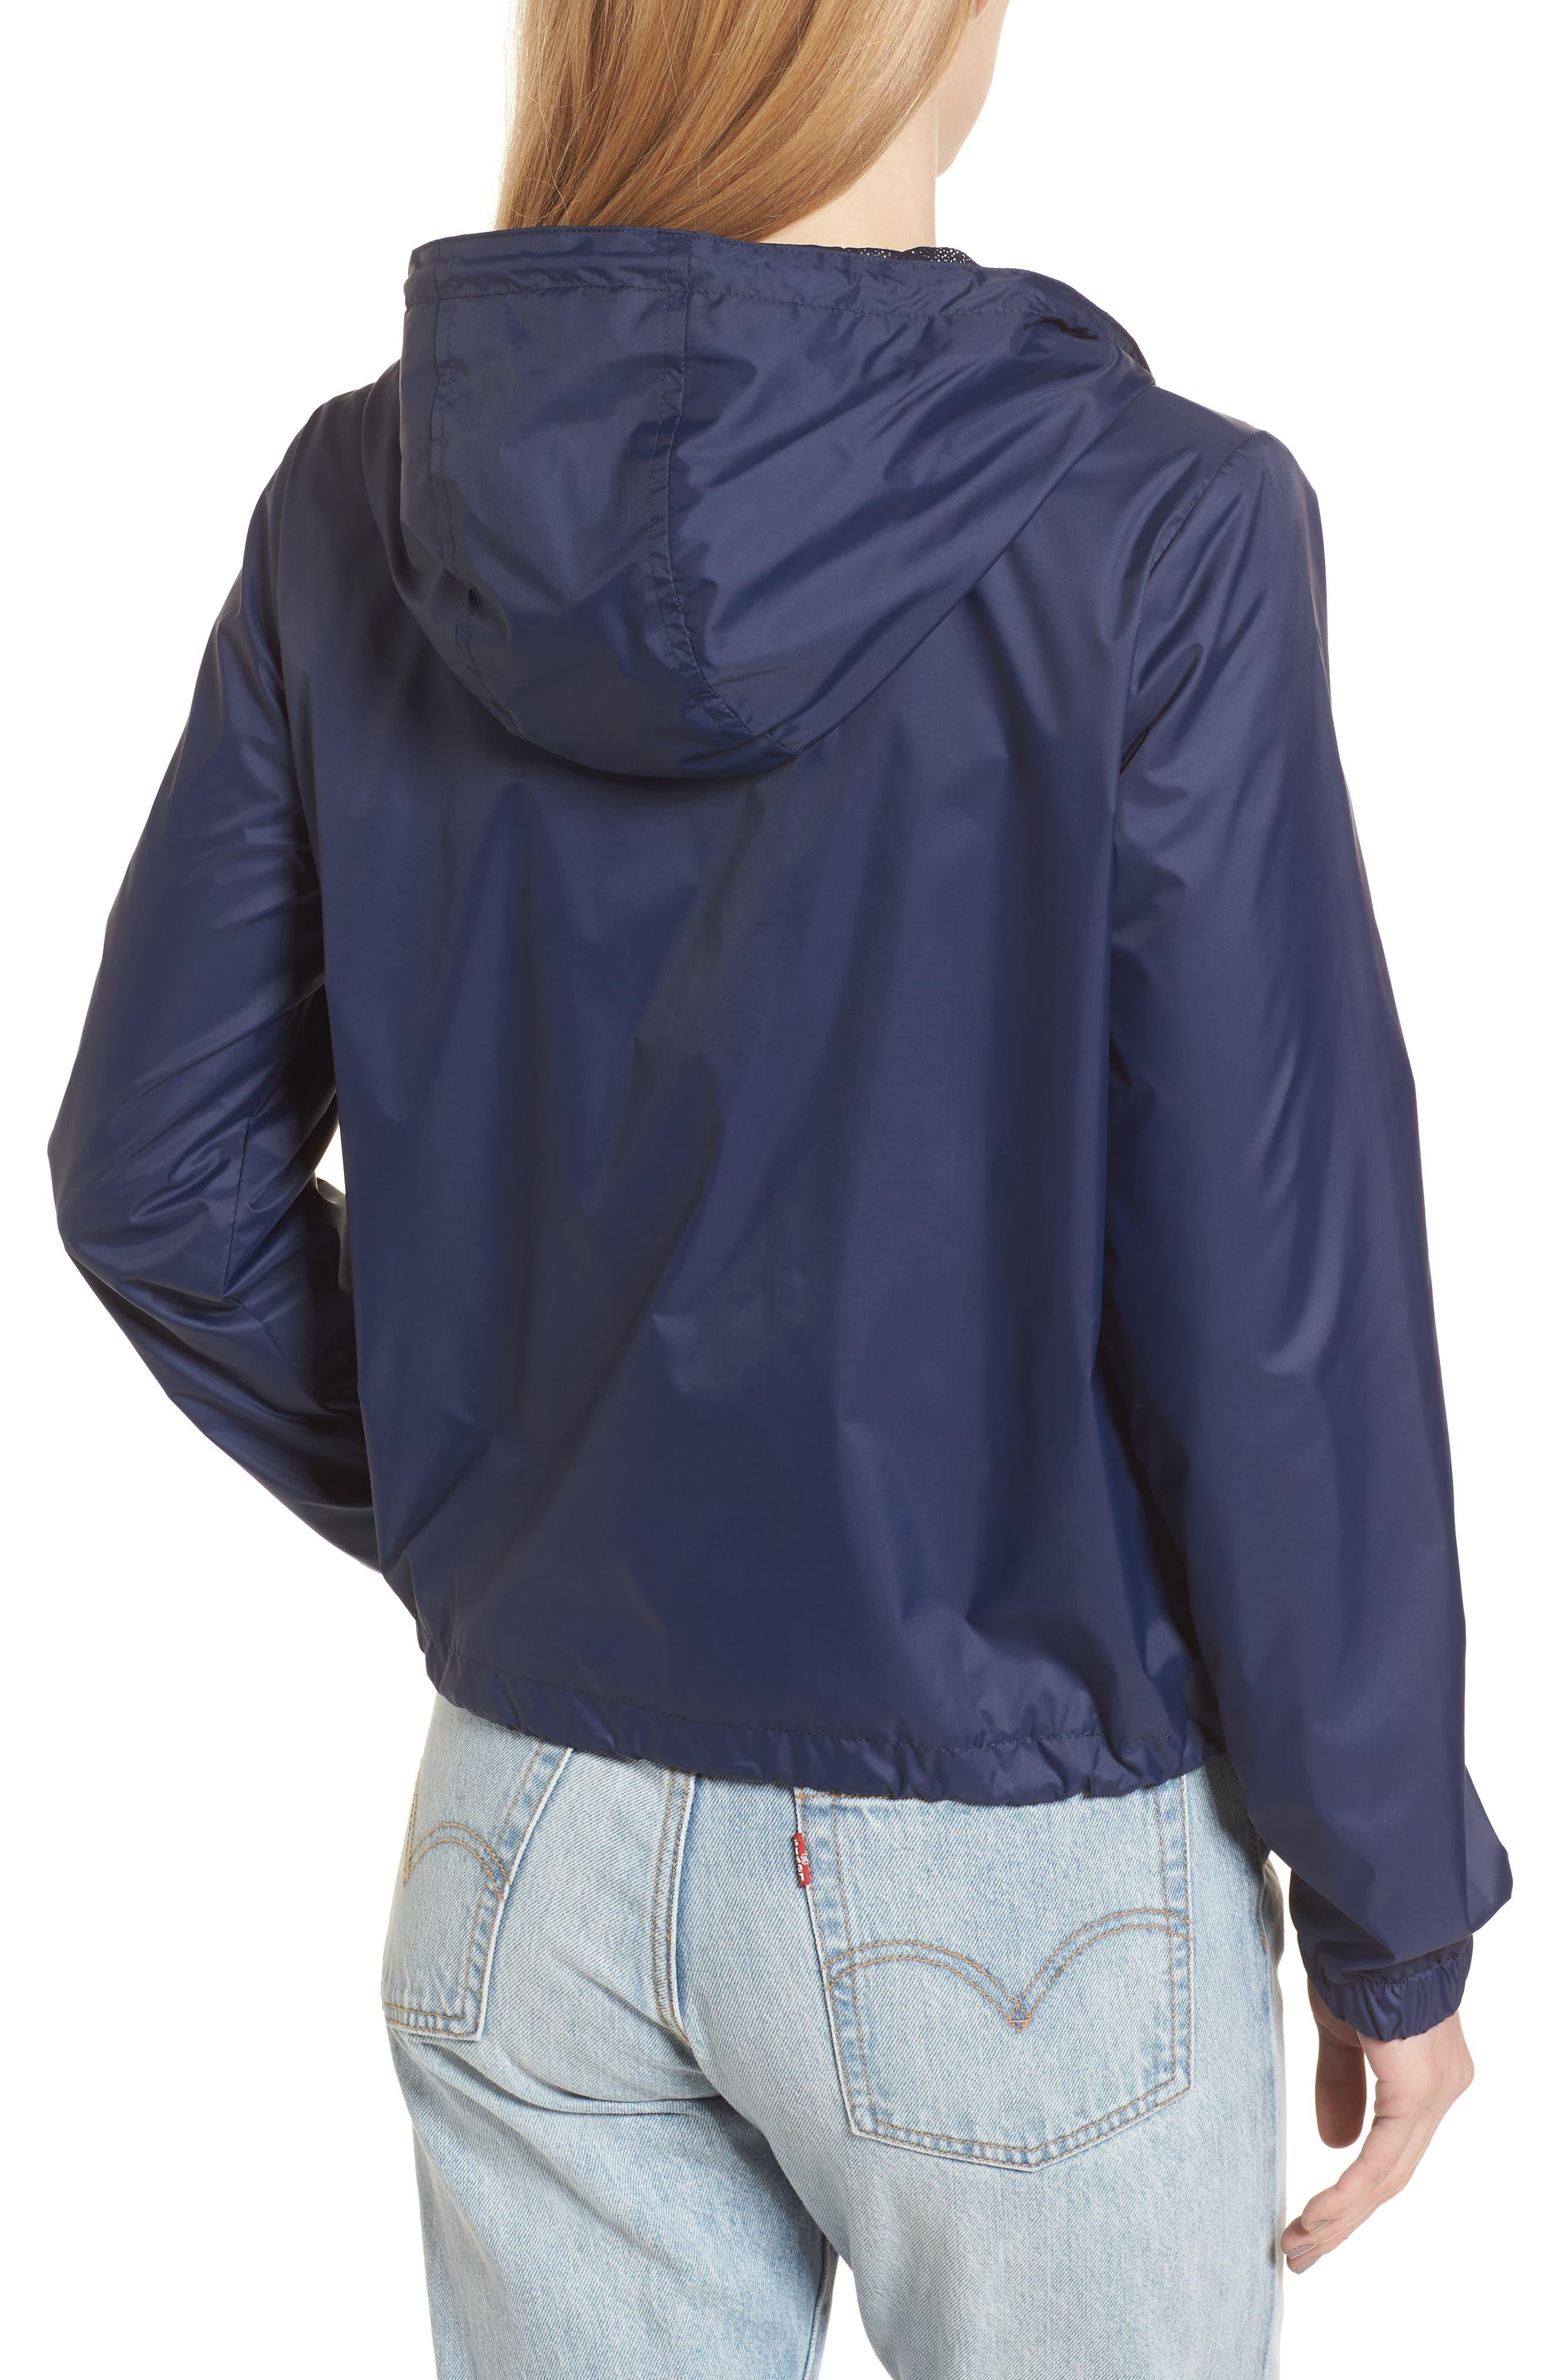 Retro Hooded Coach's Jacket,                             Alternate thumbnail 8, color,